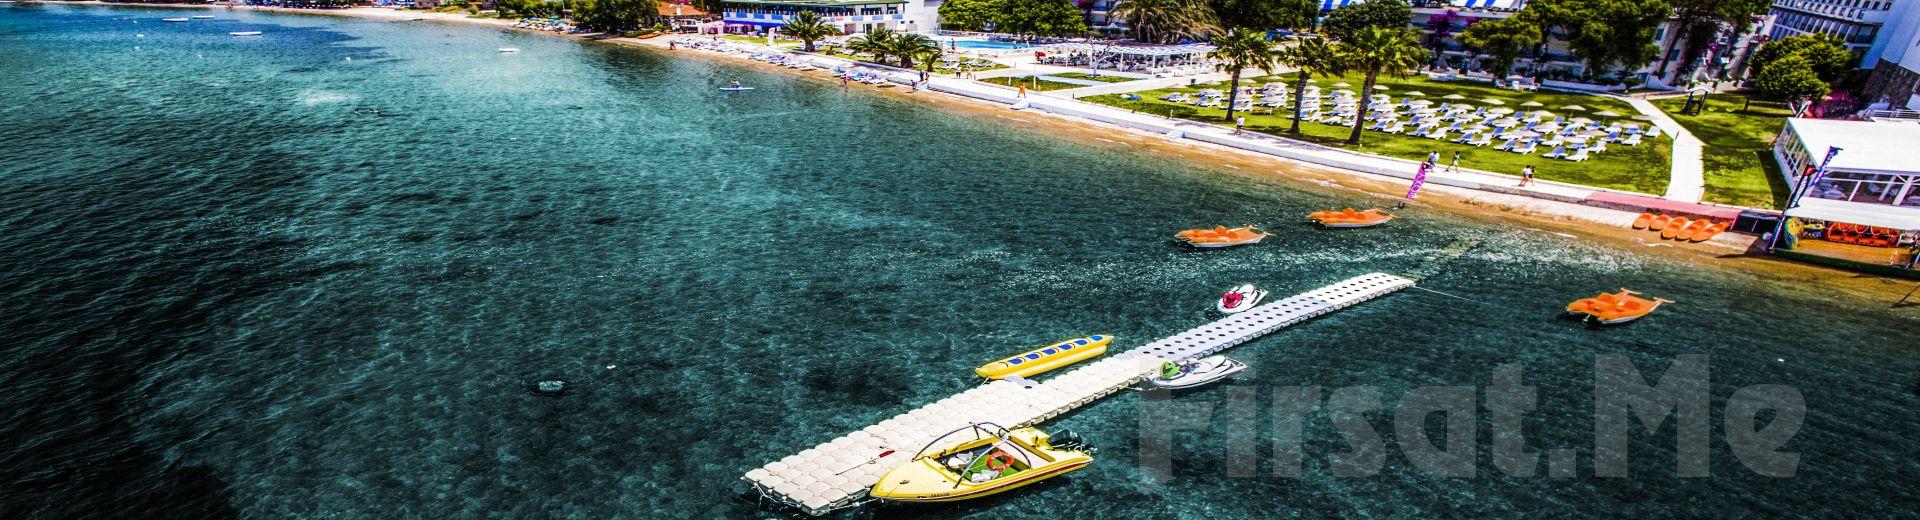 Denize Sıfır Club Blue White Bodrum'da Herşey Dahil Tatil Keyfi!